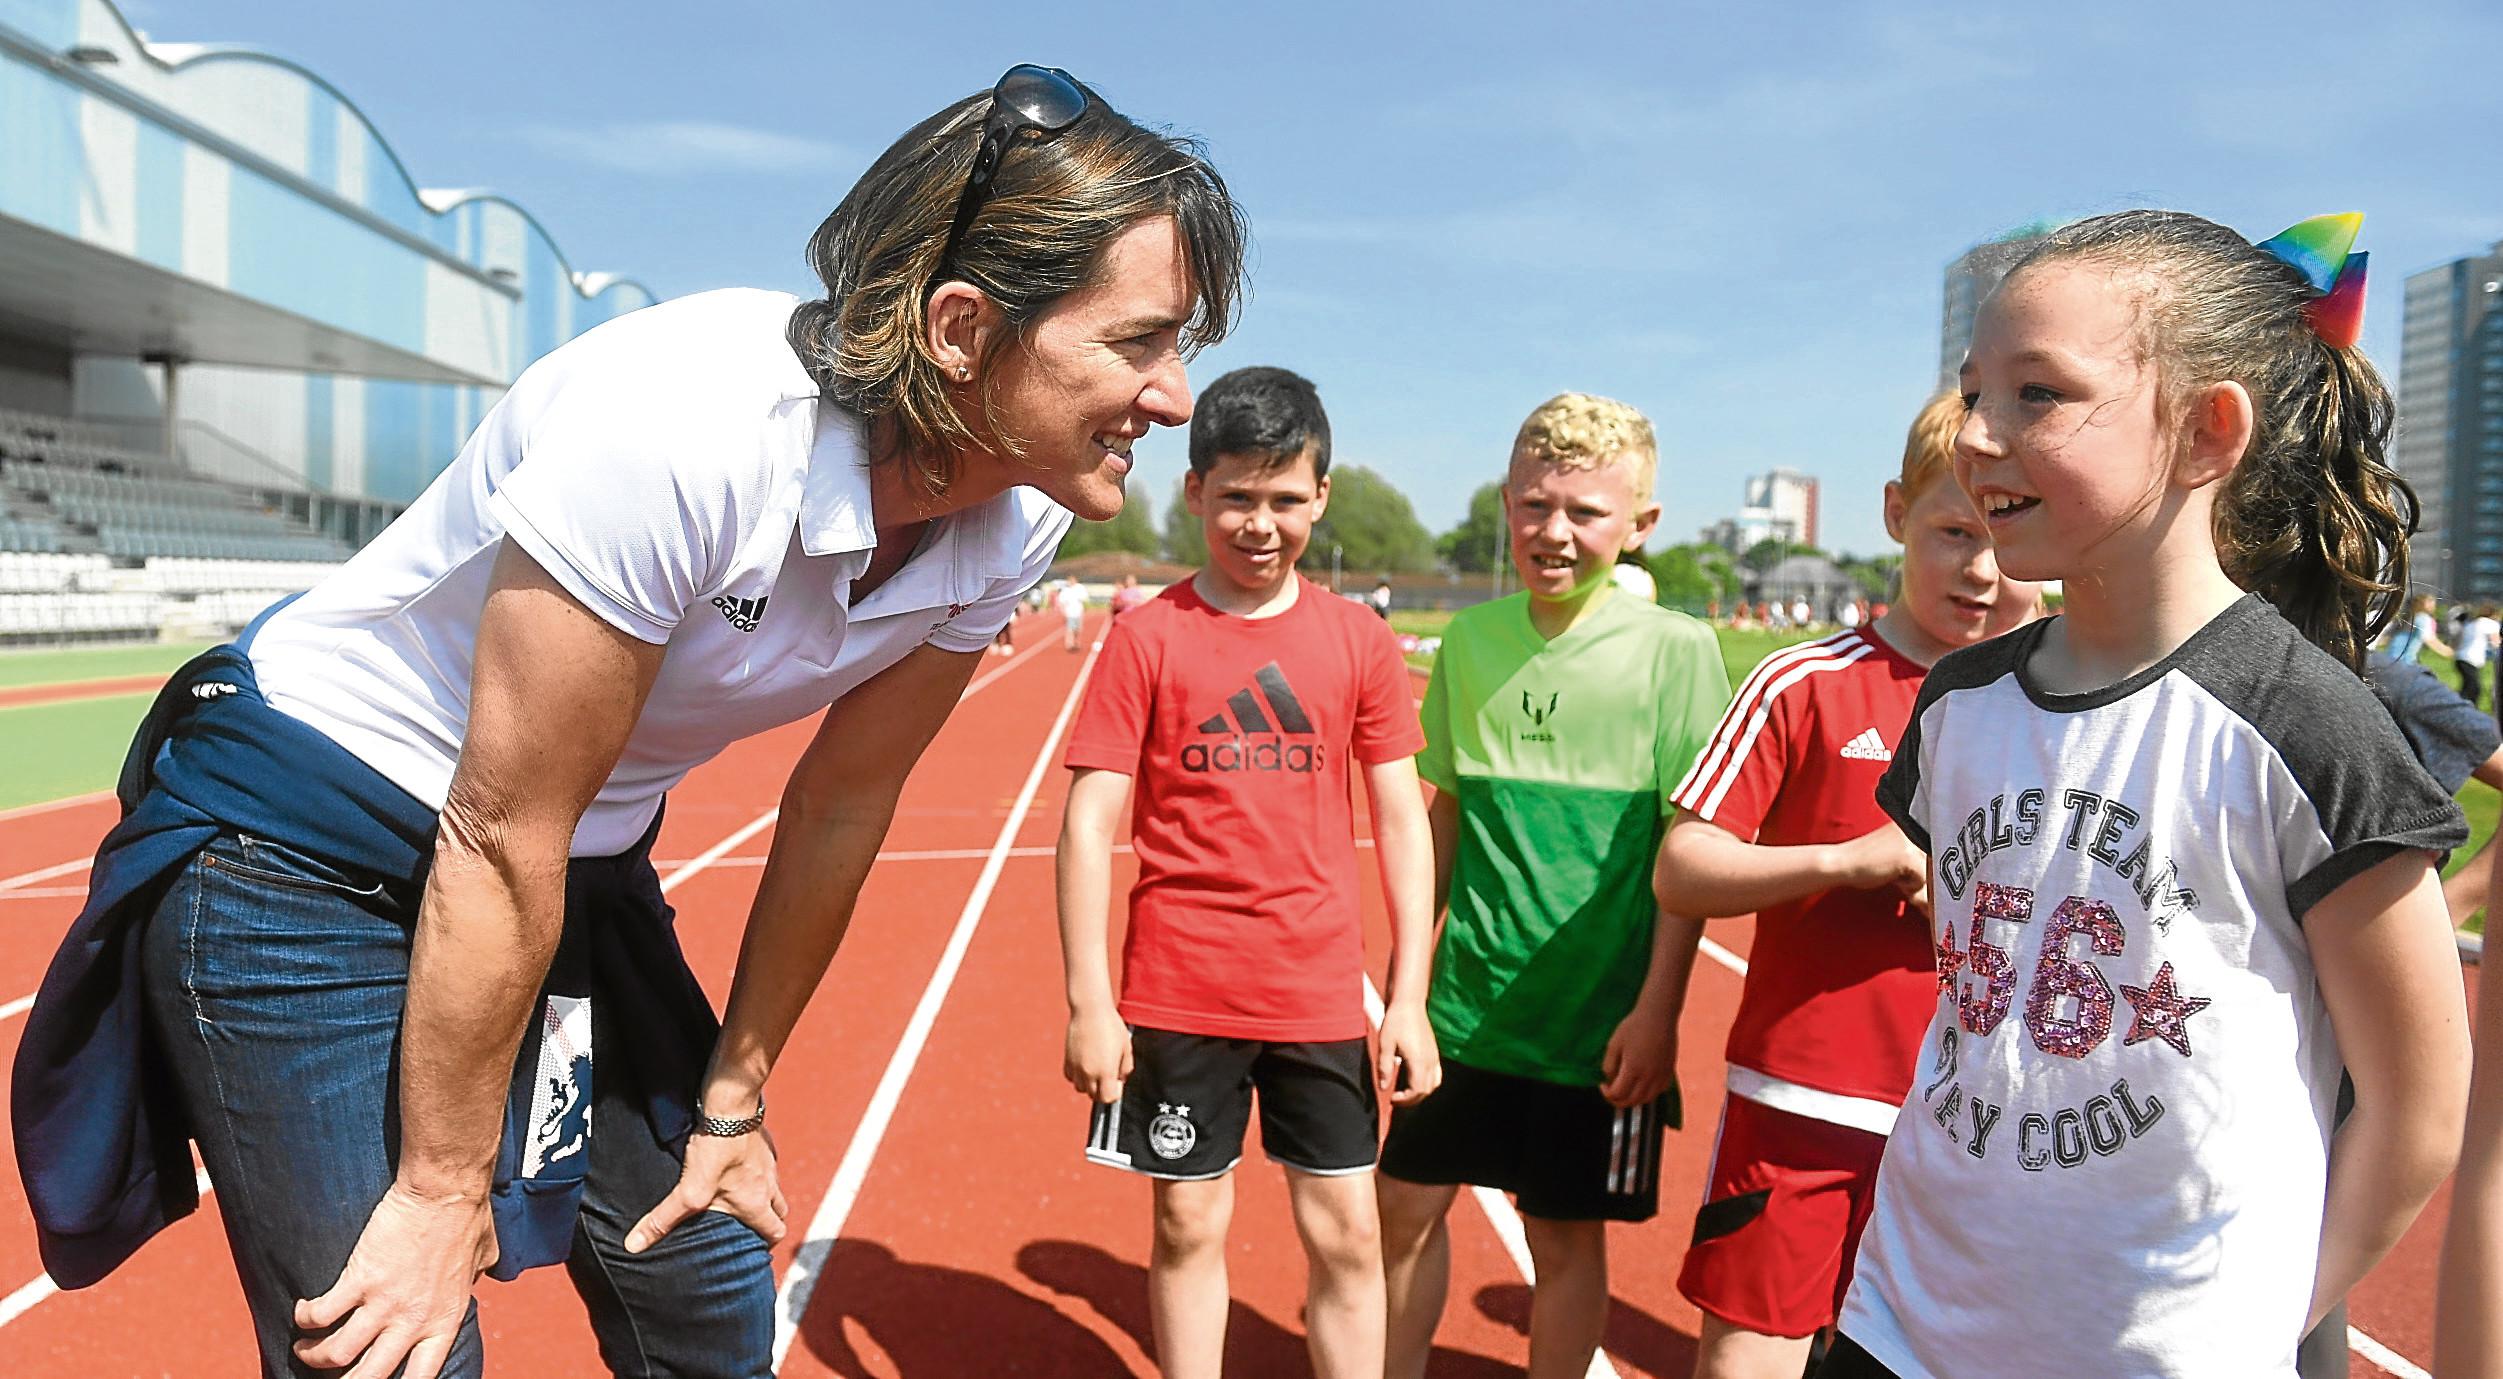 Aberdeen Youth Games Festival of Sport at Aberdeen Sports Village. Dame Katherine Grainger talks to pupils